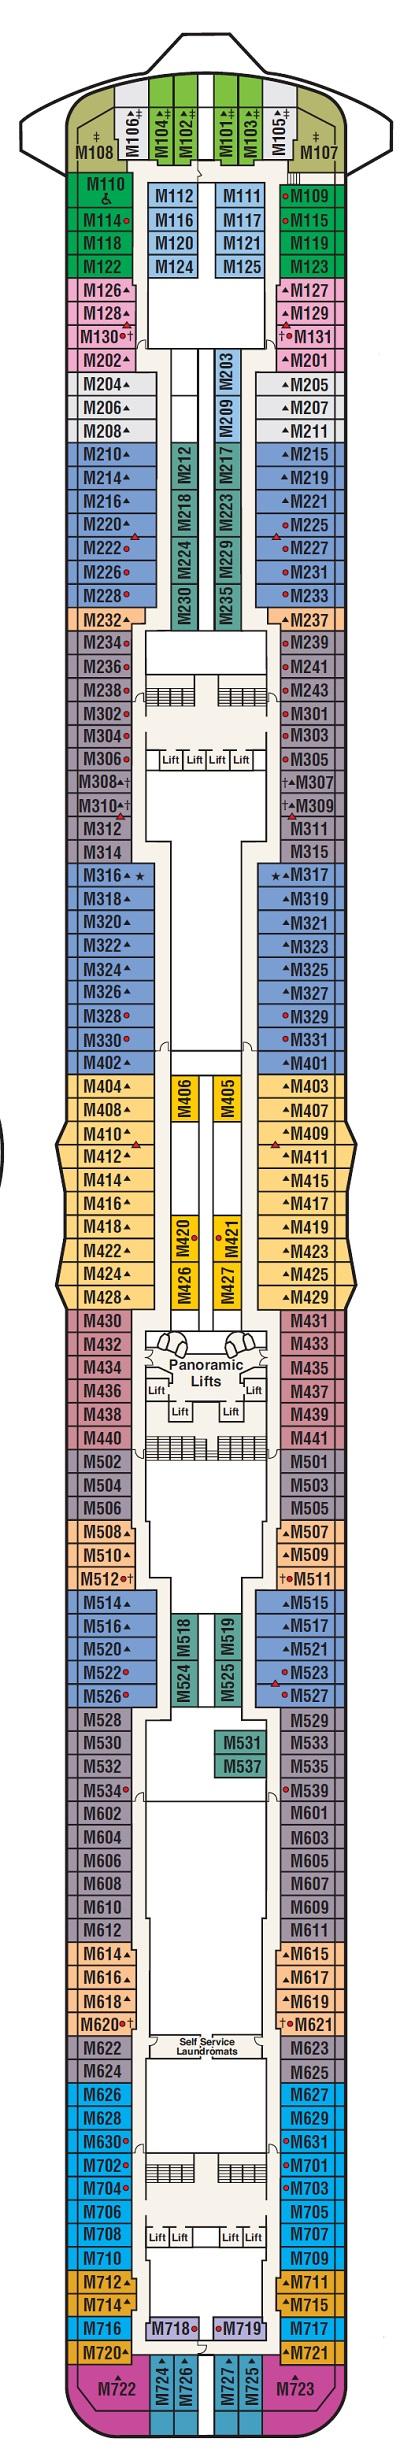 Deck 15 - Marina (starts 4-14-19)